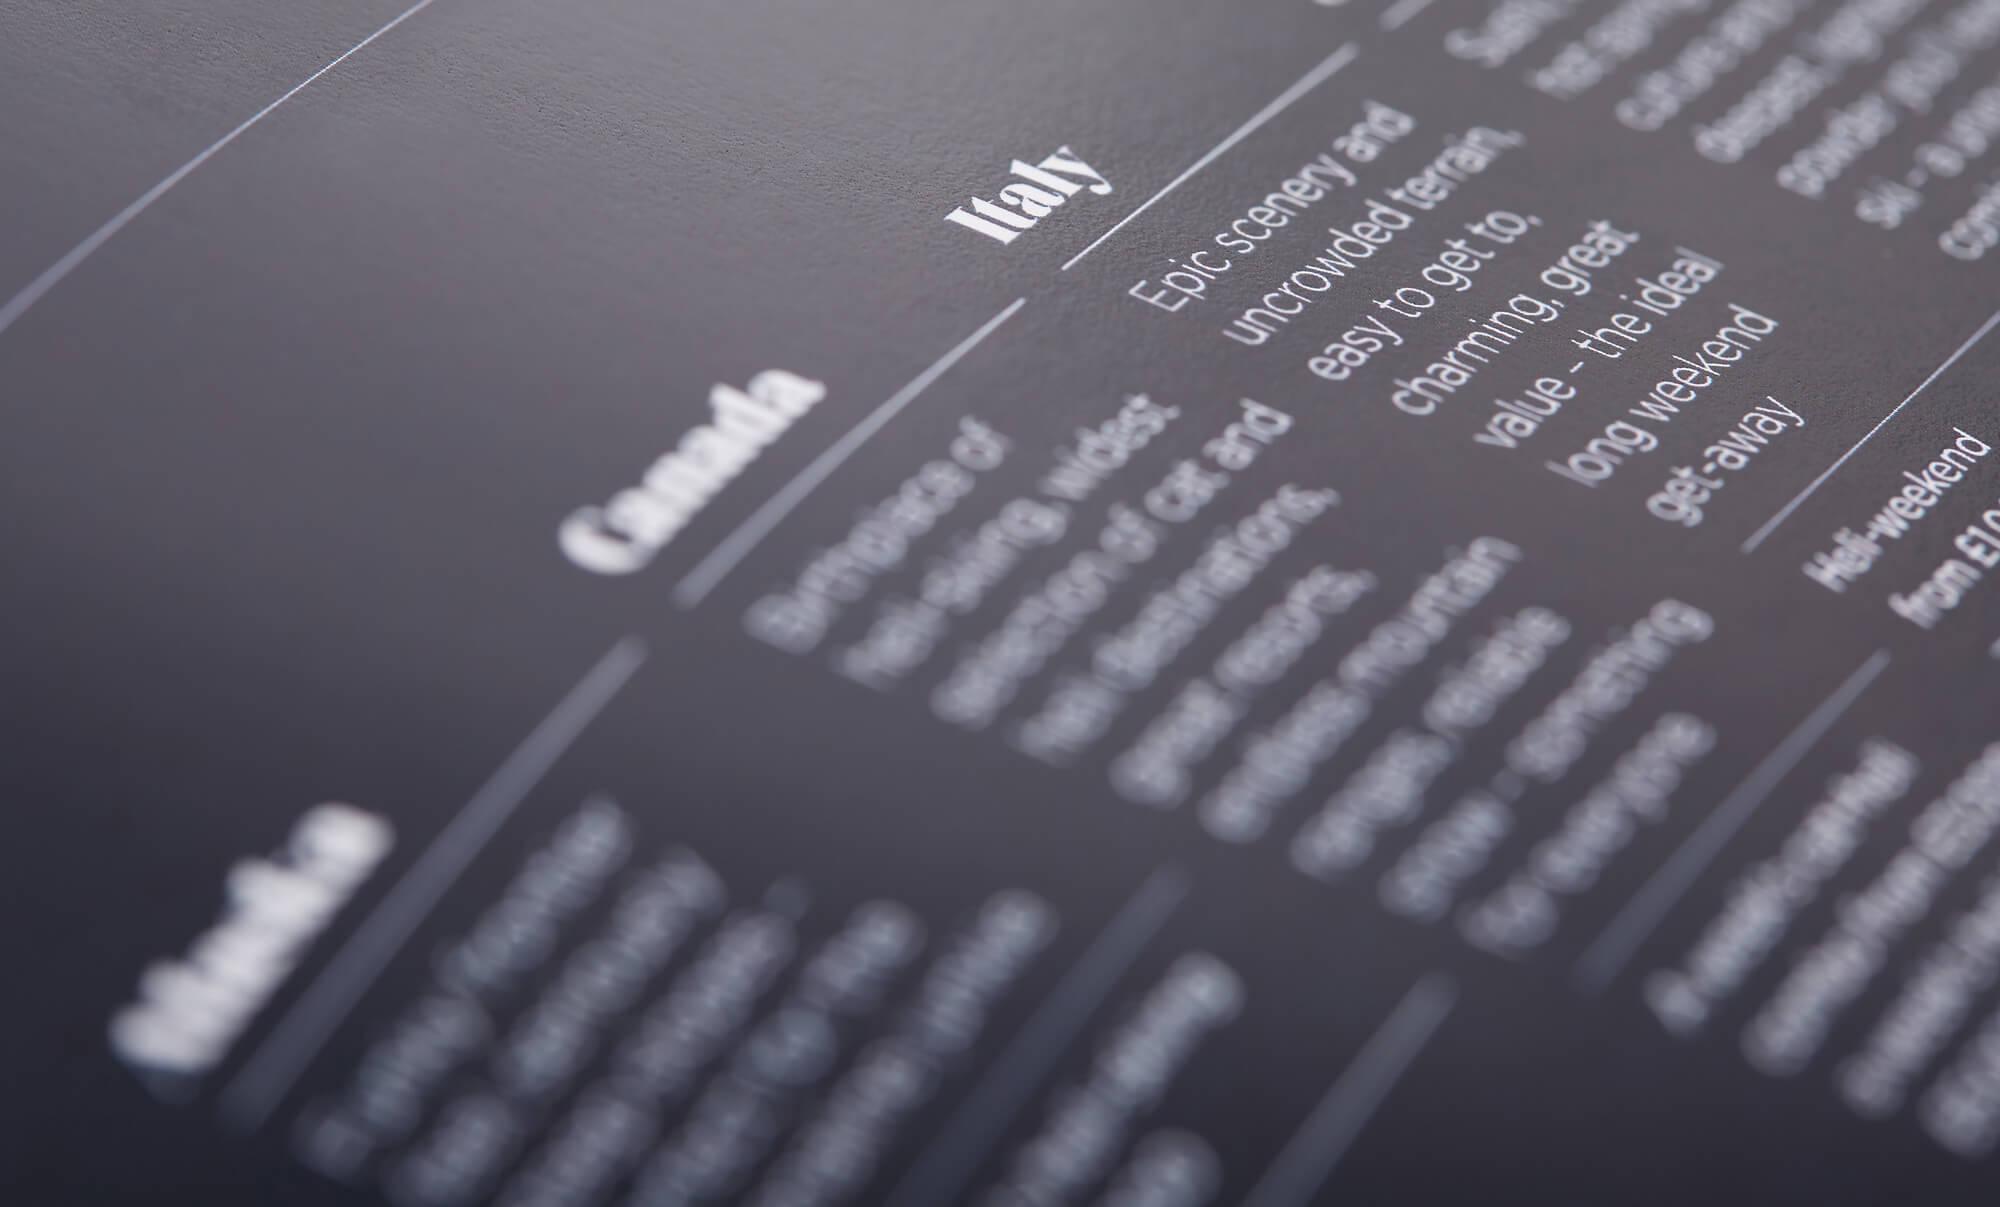 Brochure spread - detail